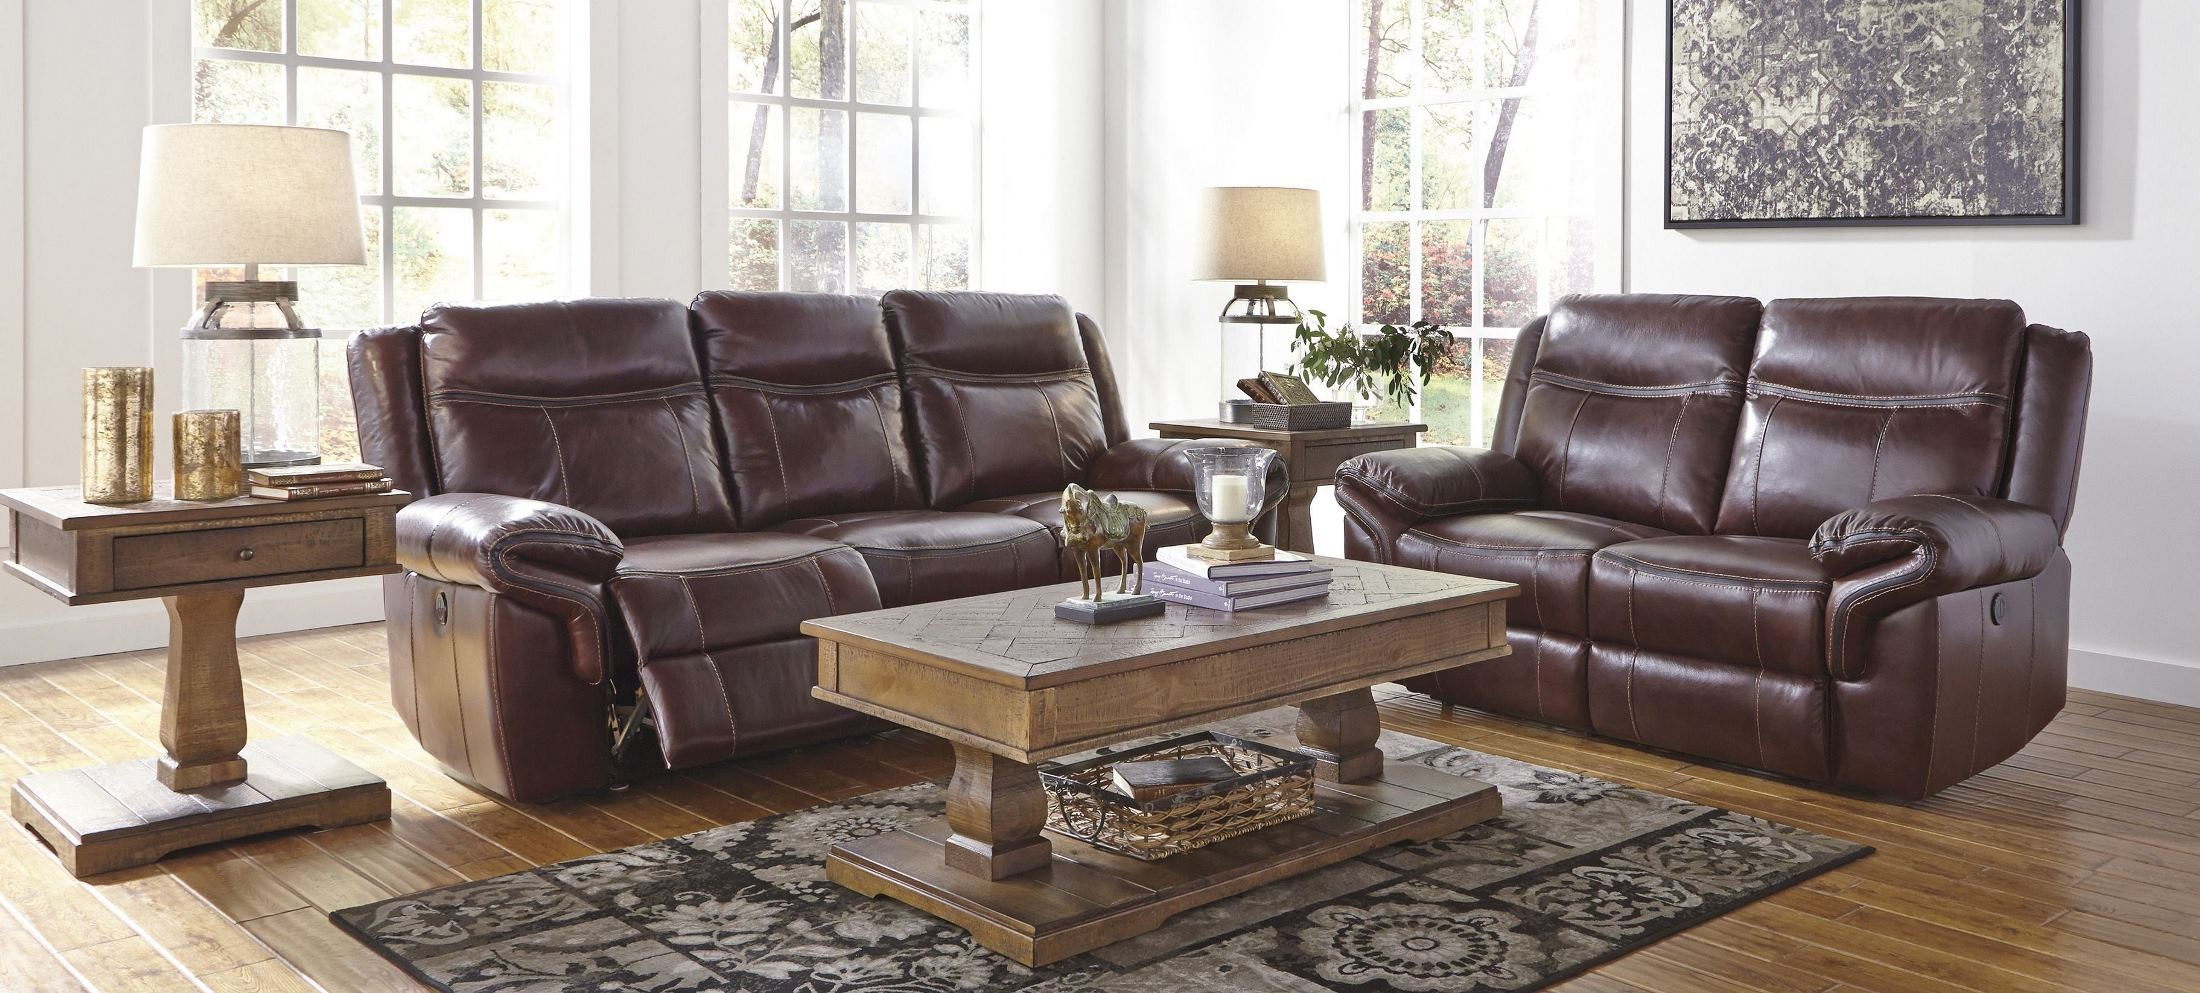 Zephen Mahogany Reclining Power Reclining Living Room Set From Ashley U7440087 Coleman Furniture